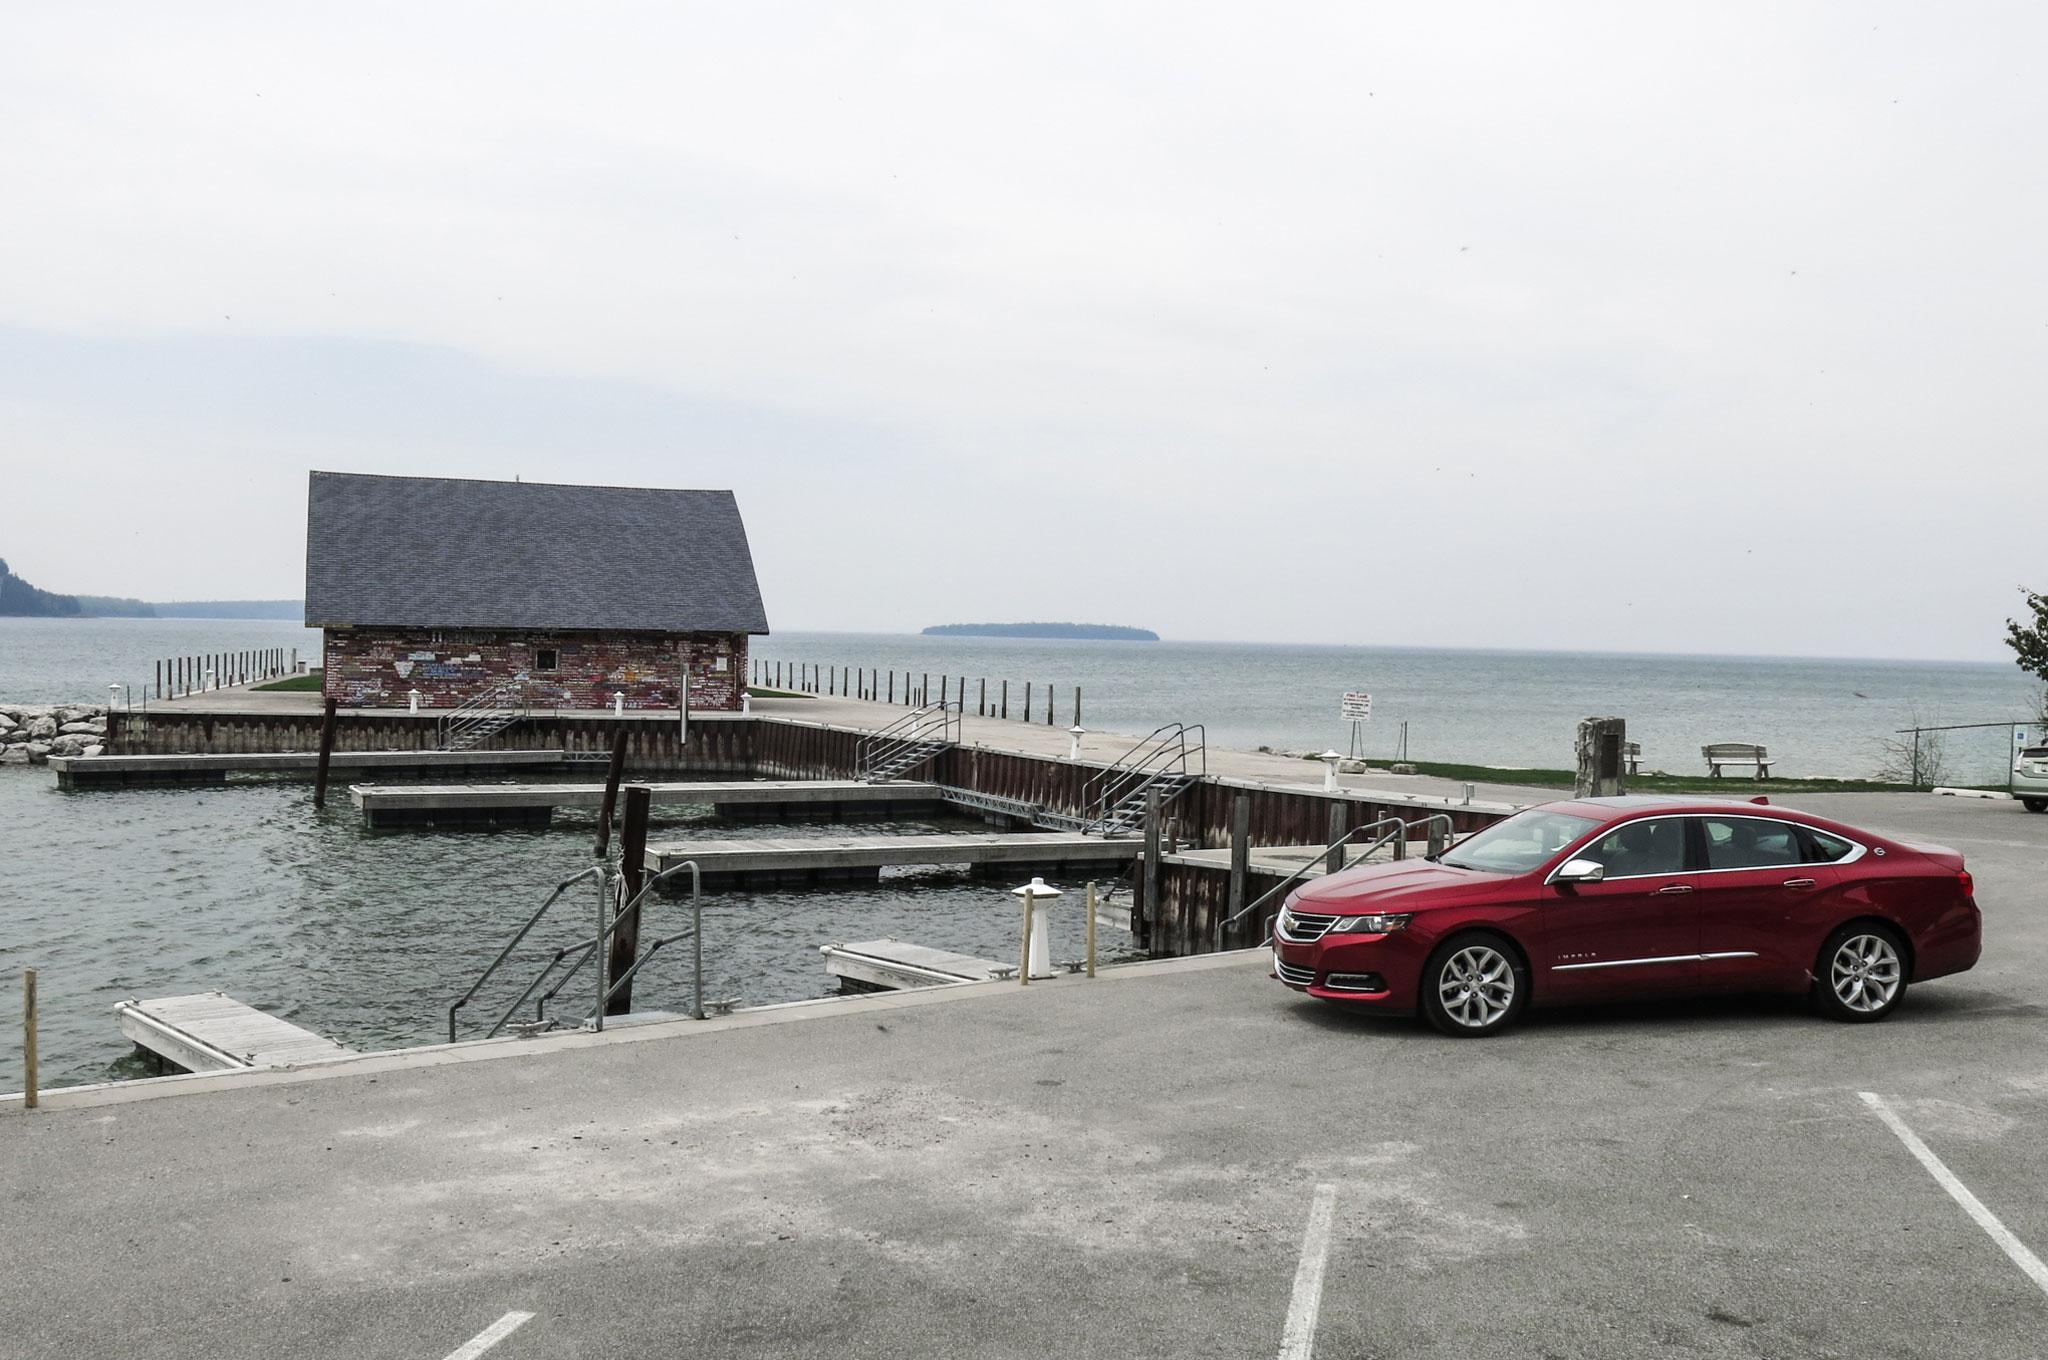 2014 Chevrolet Impala Lake Michigan Left Side View 181